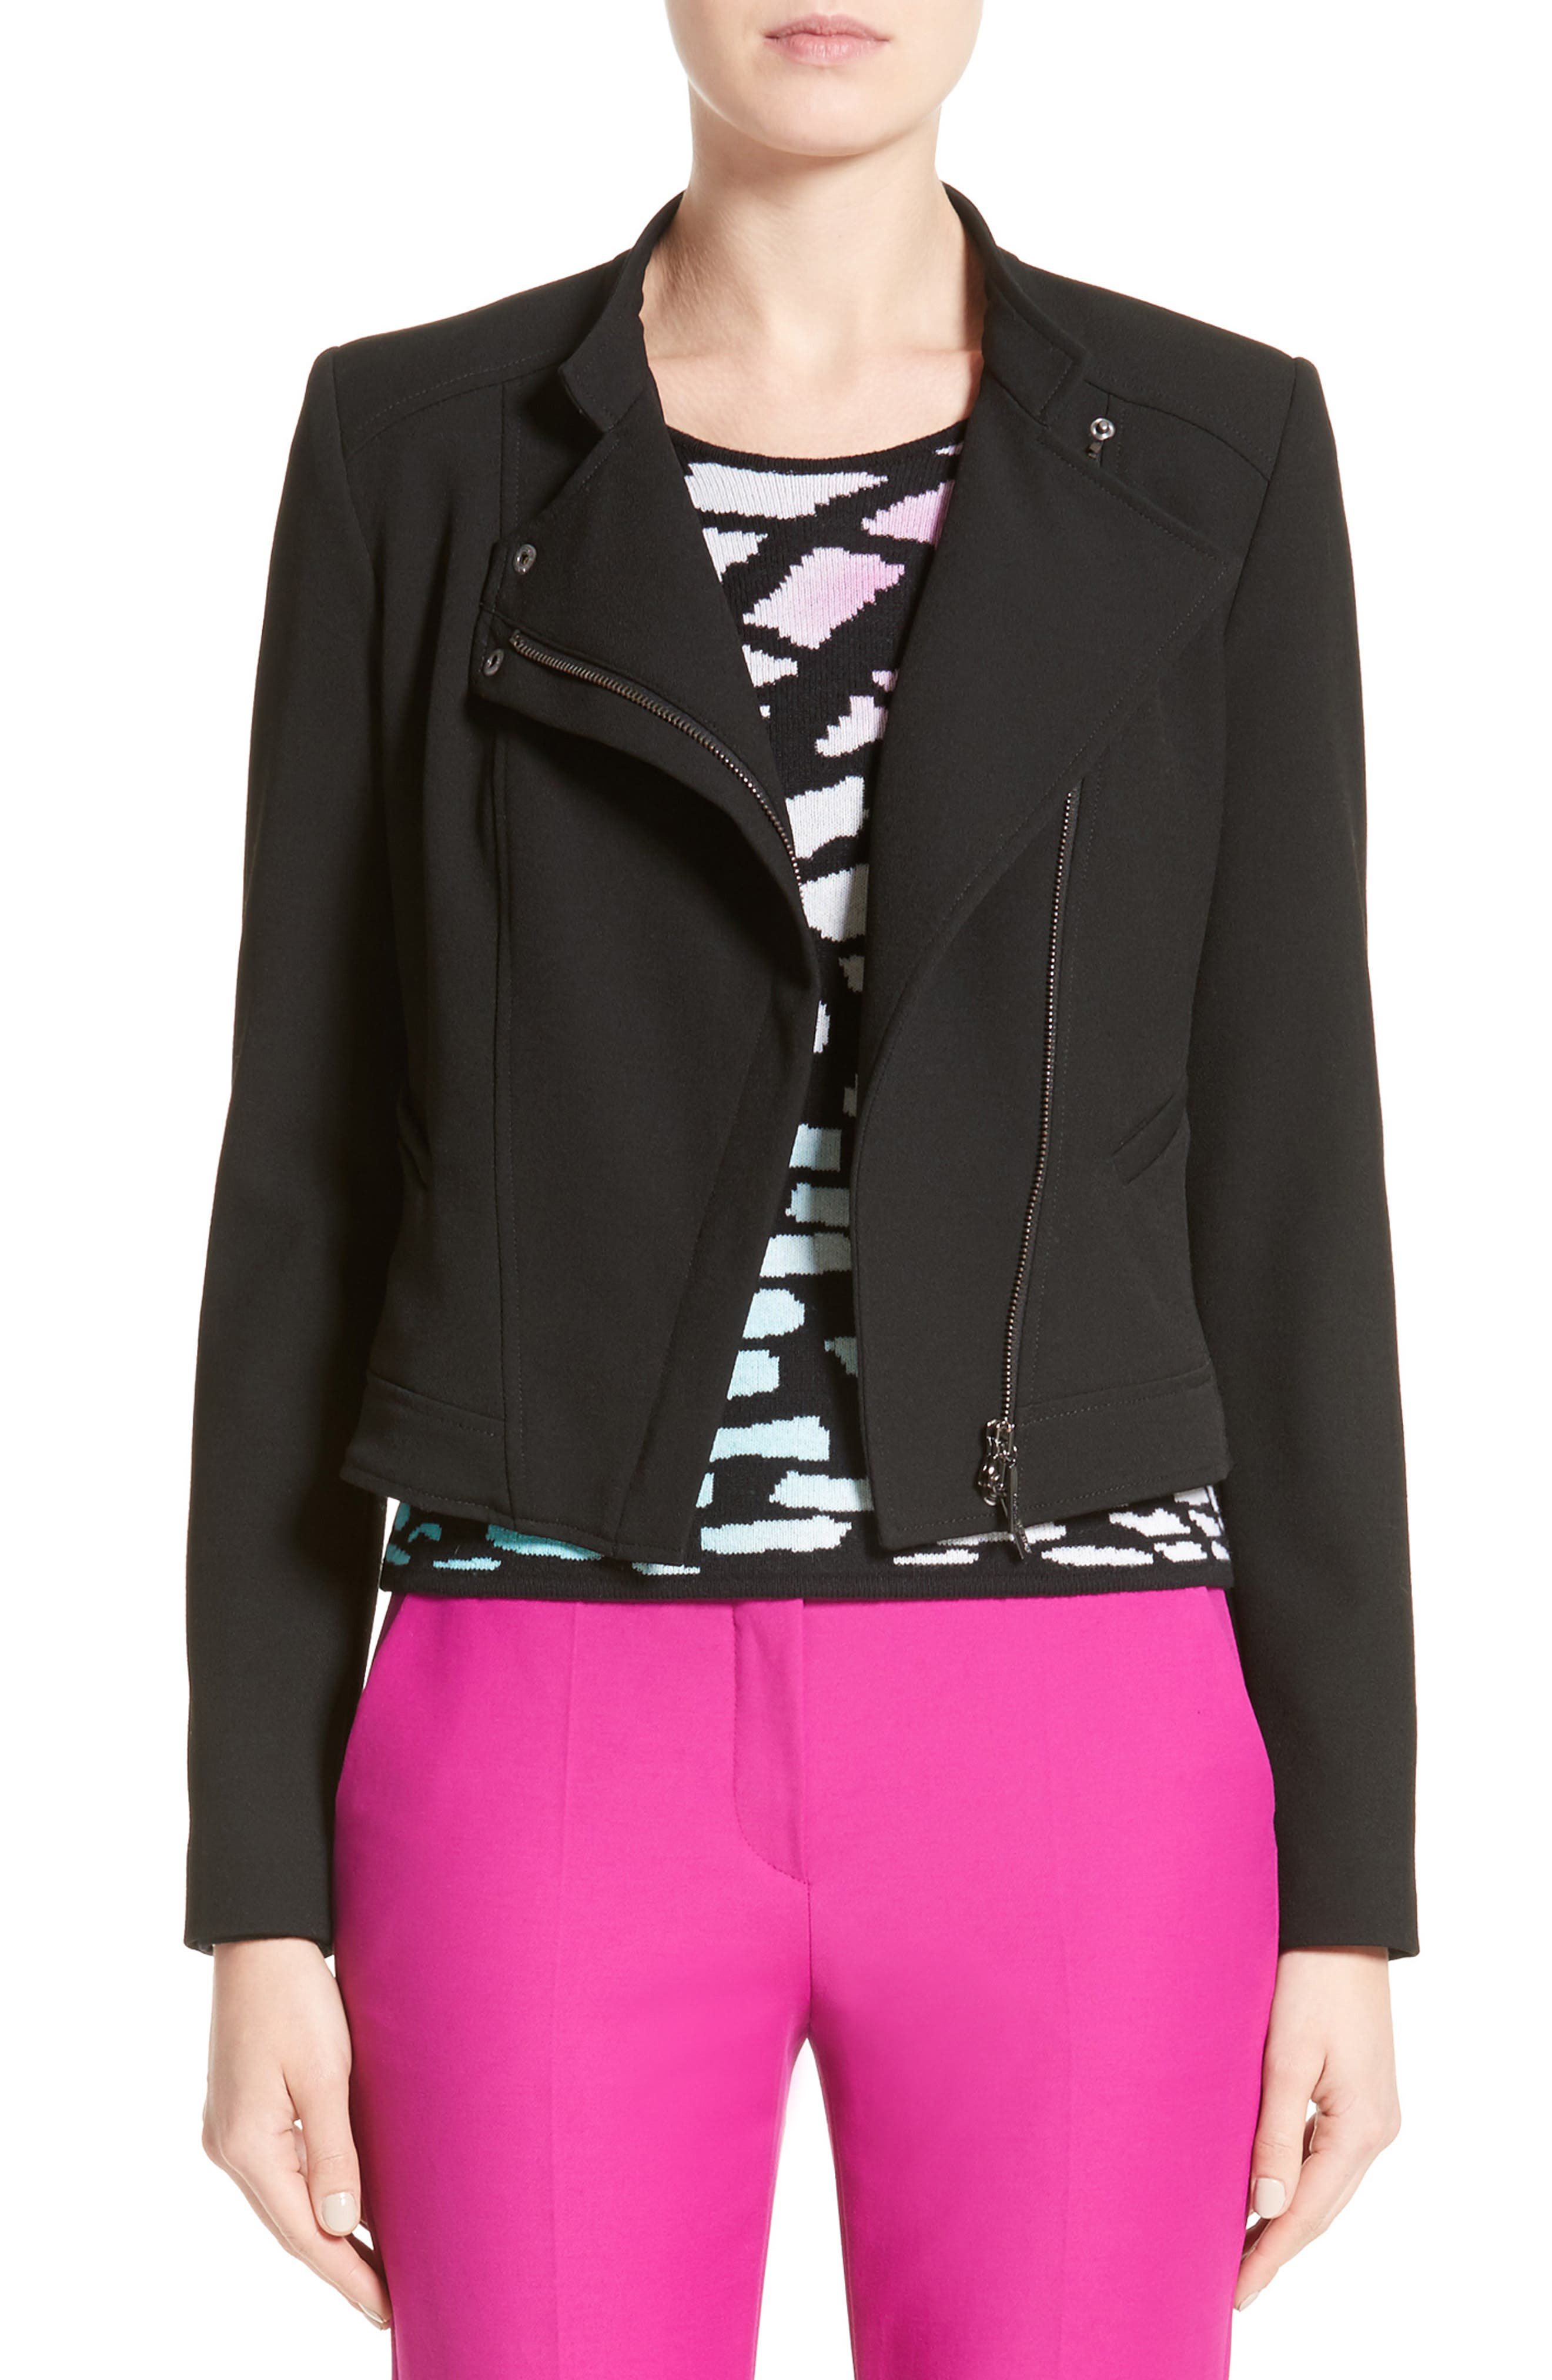 Armani Jeans Crepe Moto Jacket,                             Main thumbnail 1, color,                             Black